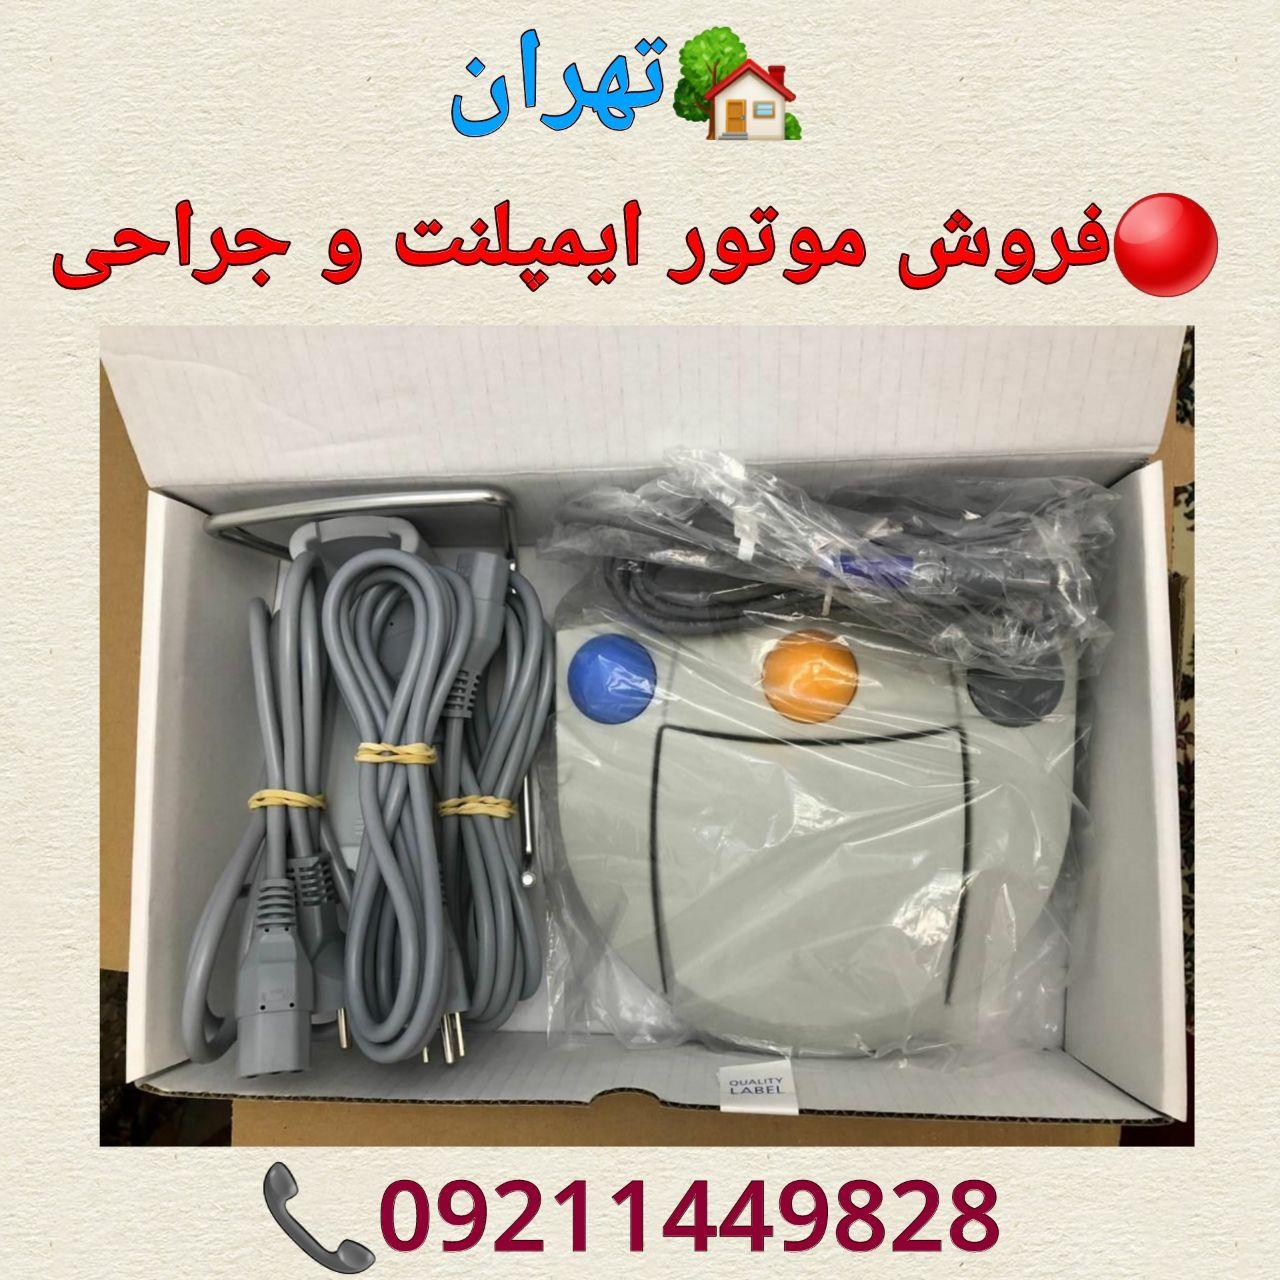 تهران: فروش موتور ایمپلنت و جراحی